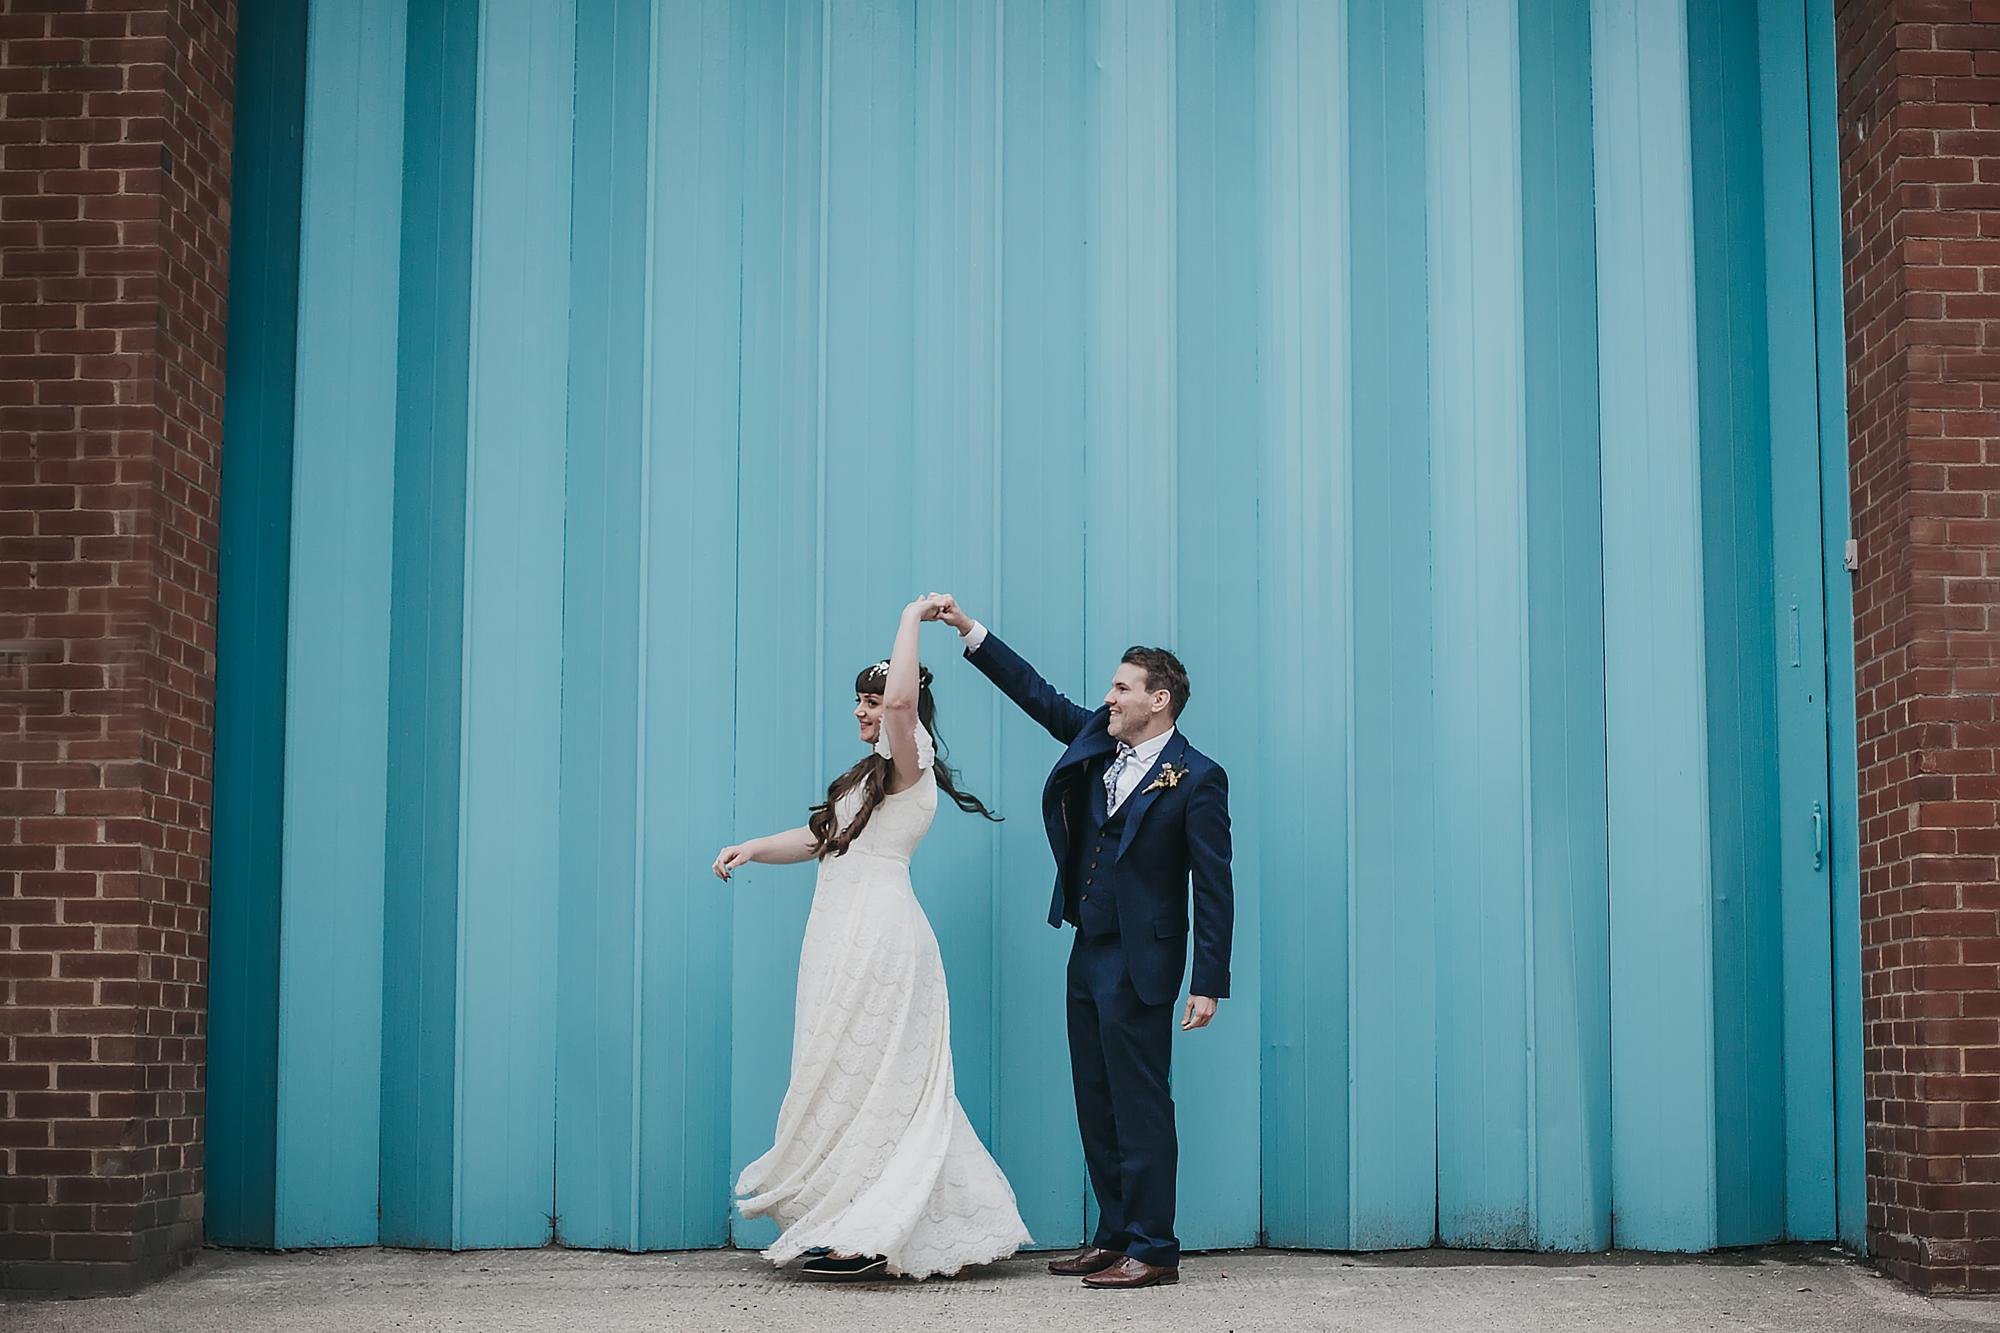 Kristy-Back-Garden-Outdoor-Wedding-Sheffield-Industrial-Warehouse-Wedding-Bohemian-Kate-Beaumont-Dahlia-Dress-46.jpg